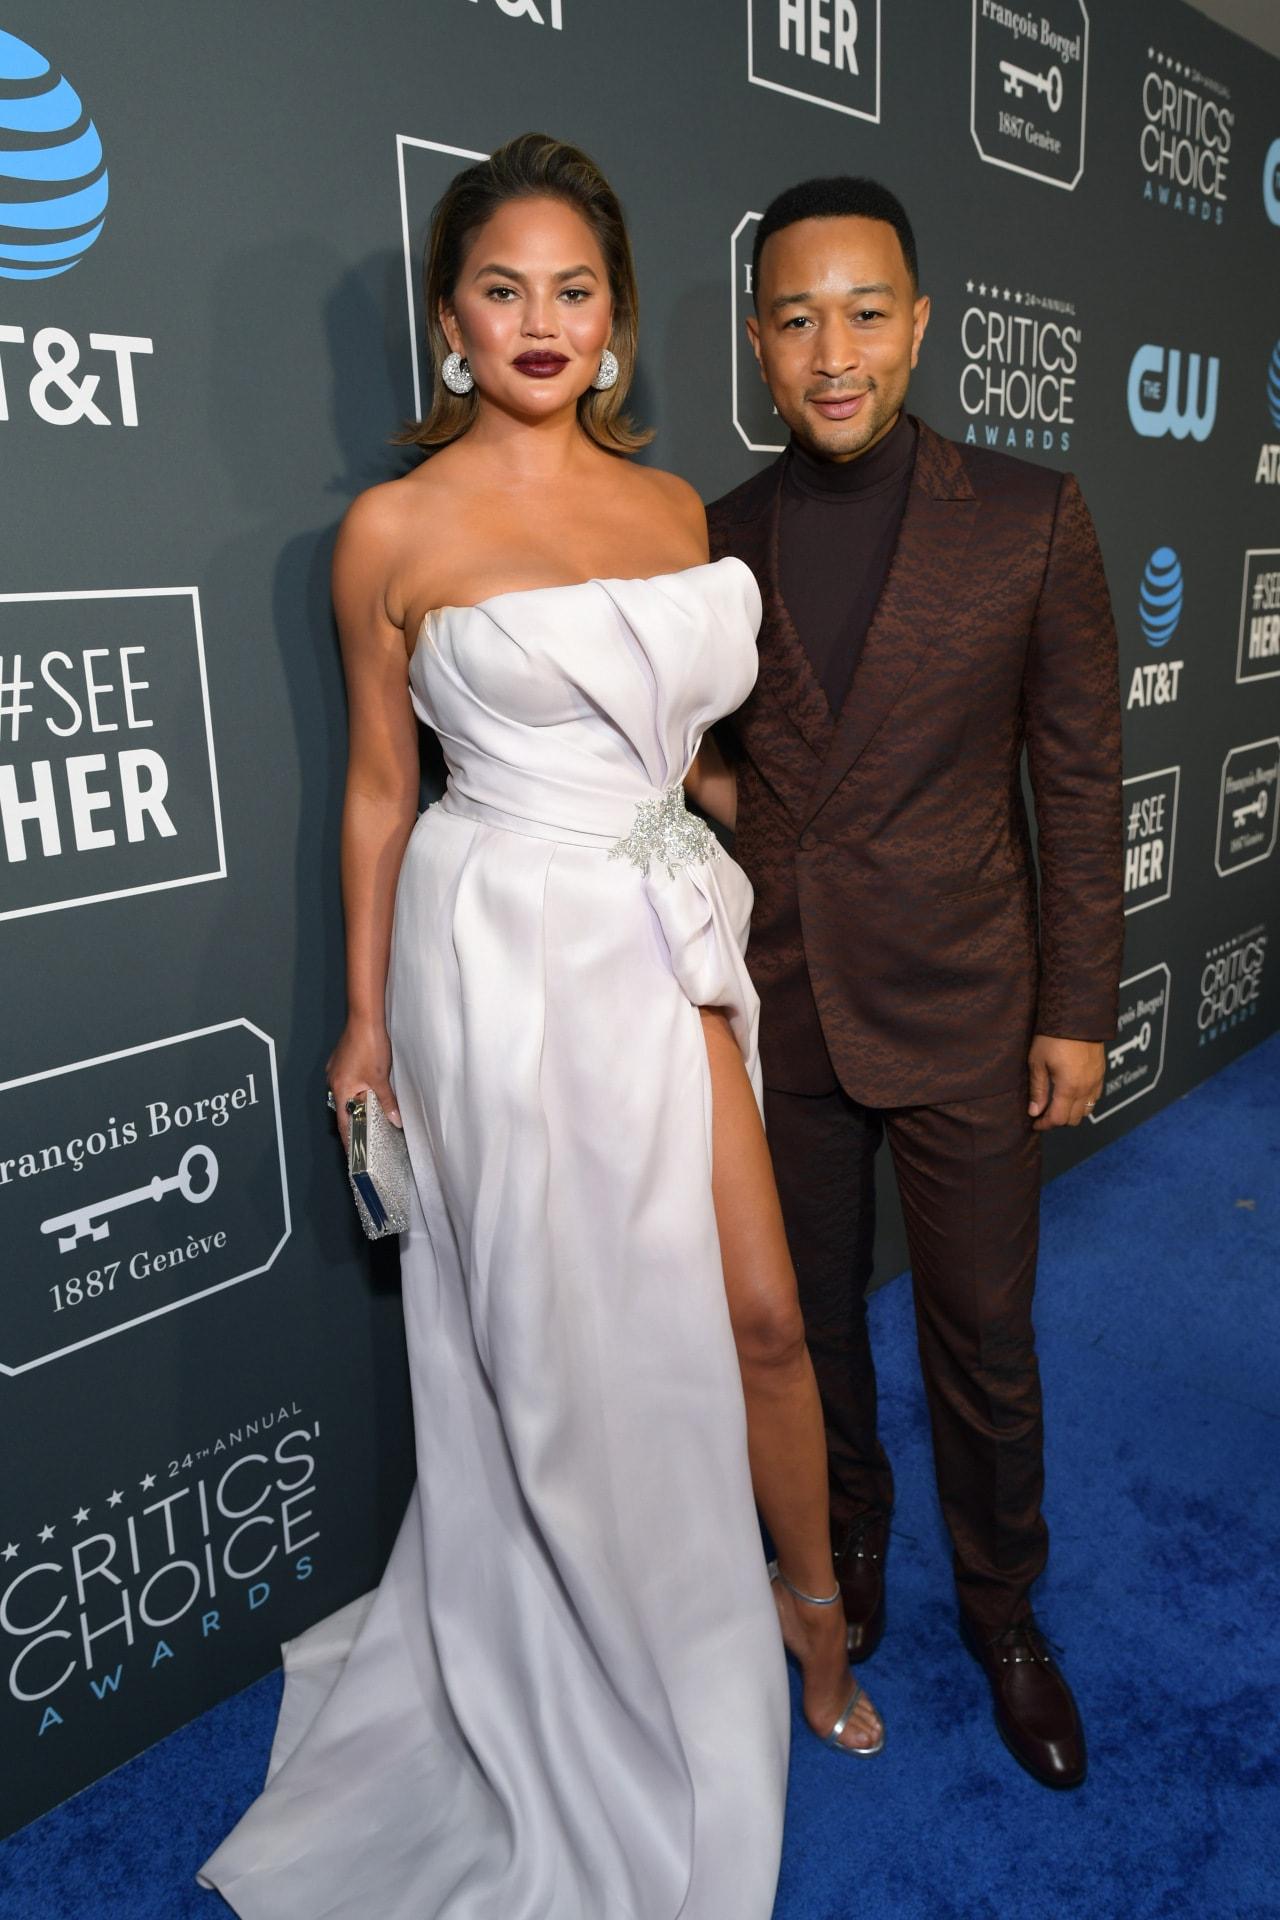 Chrissy Teigen and John Legend got into a big fight at Kim Kardashian's wedding